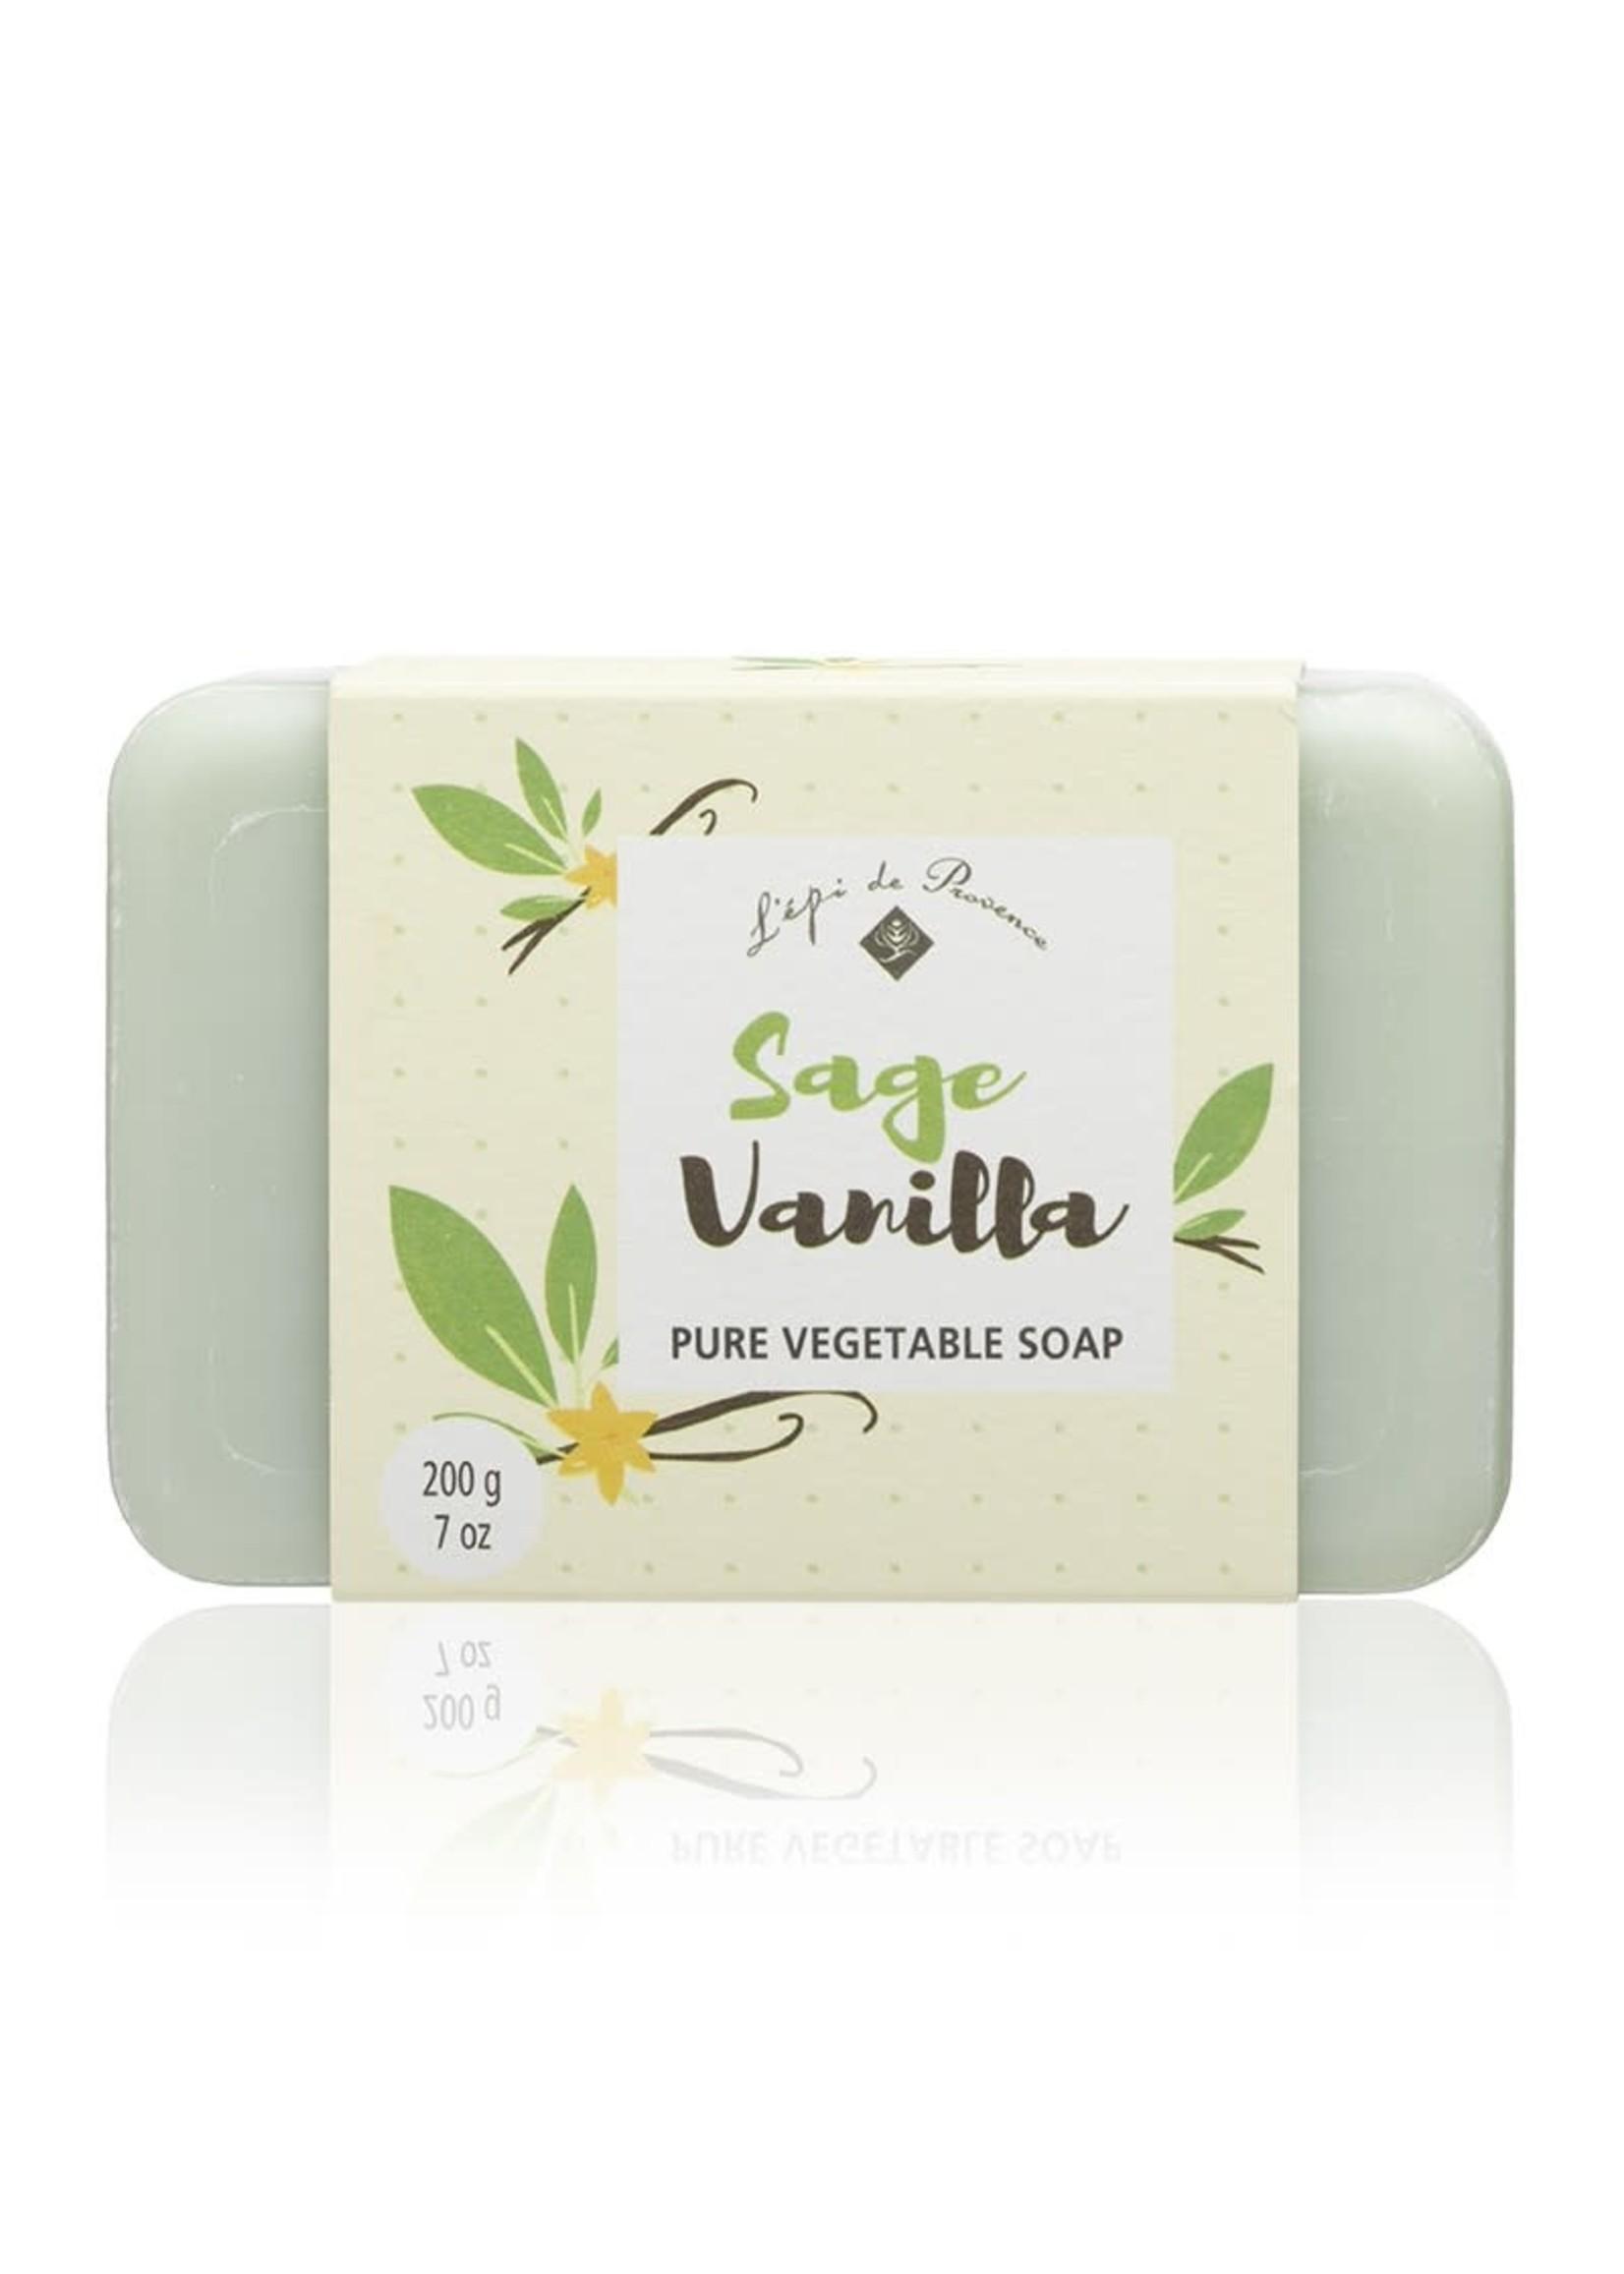 Echo France Soap Sage Vanilla 200g Soap